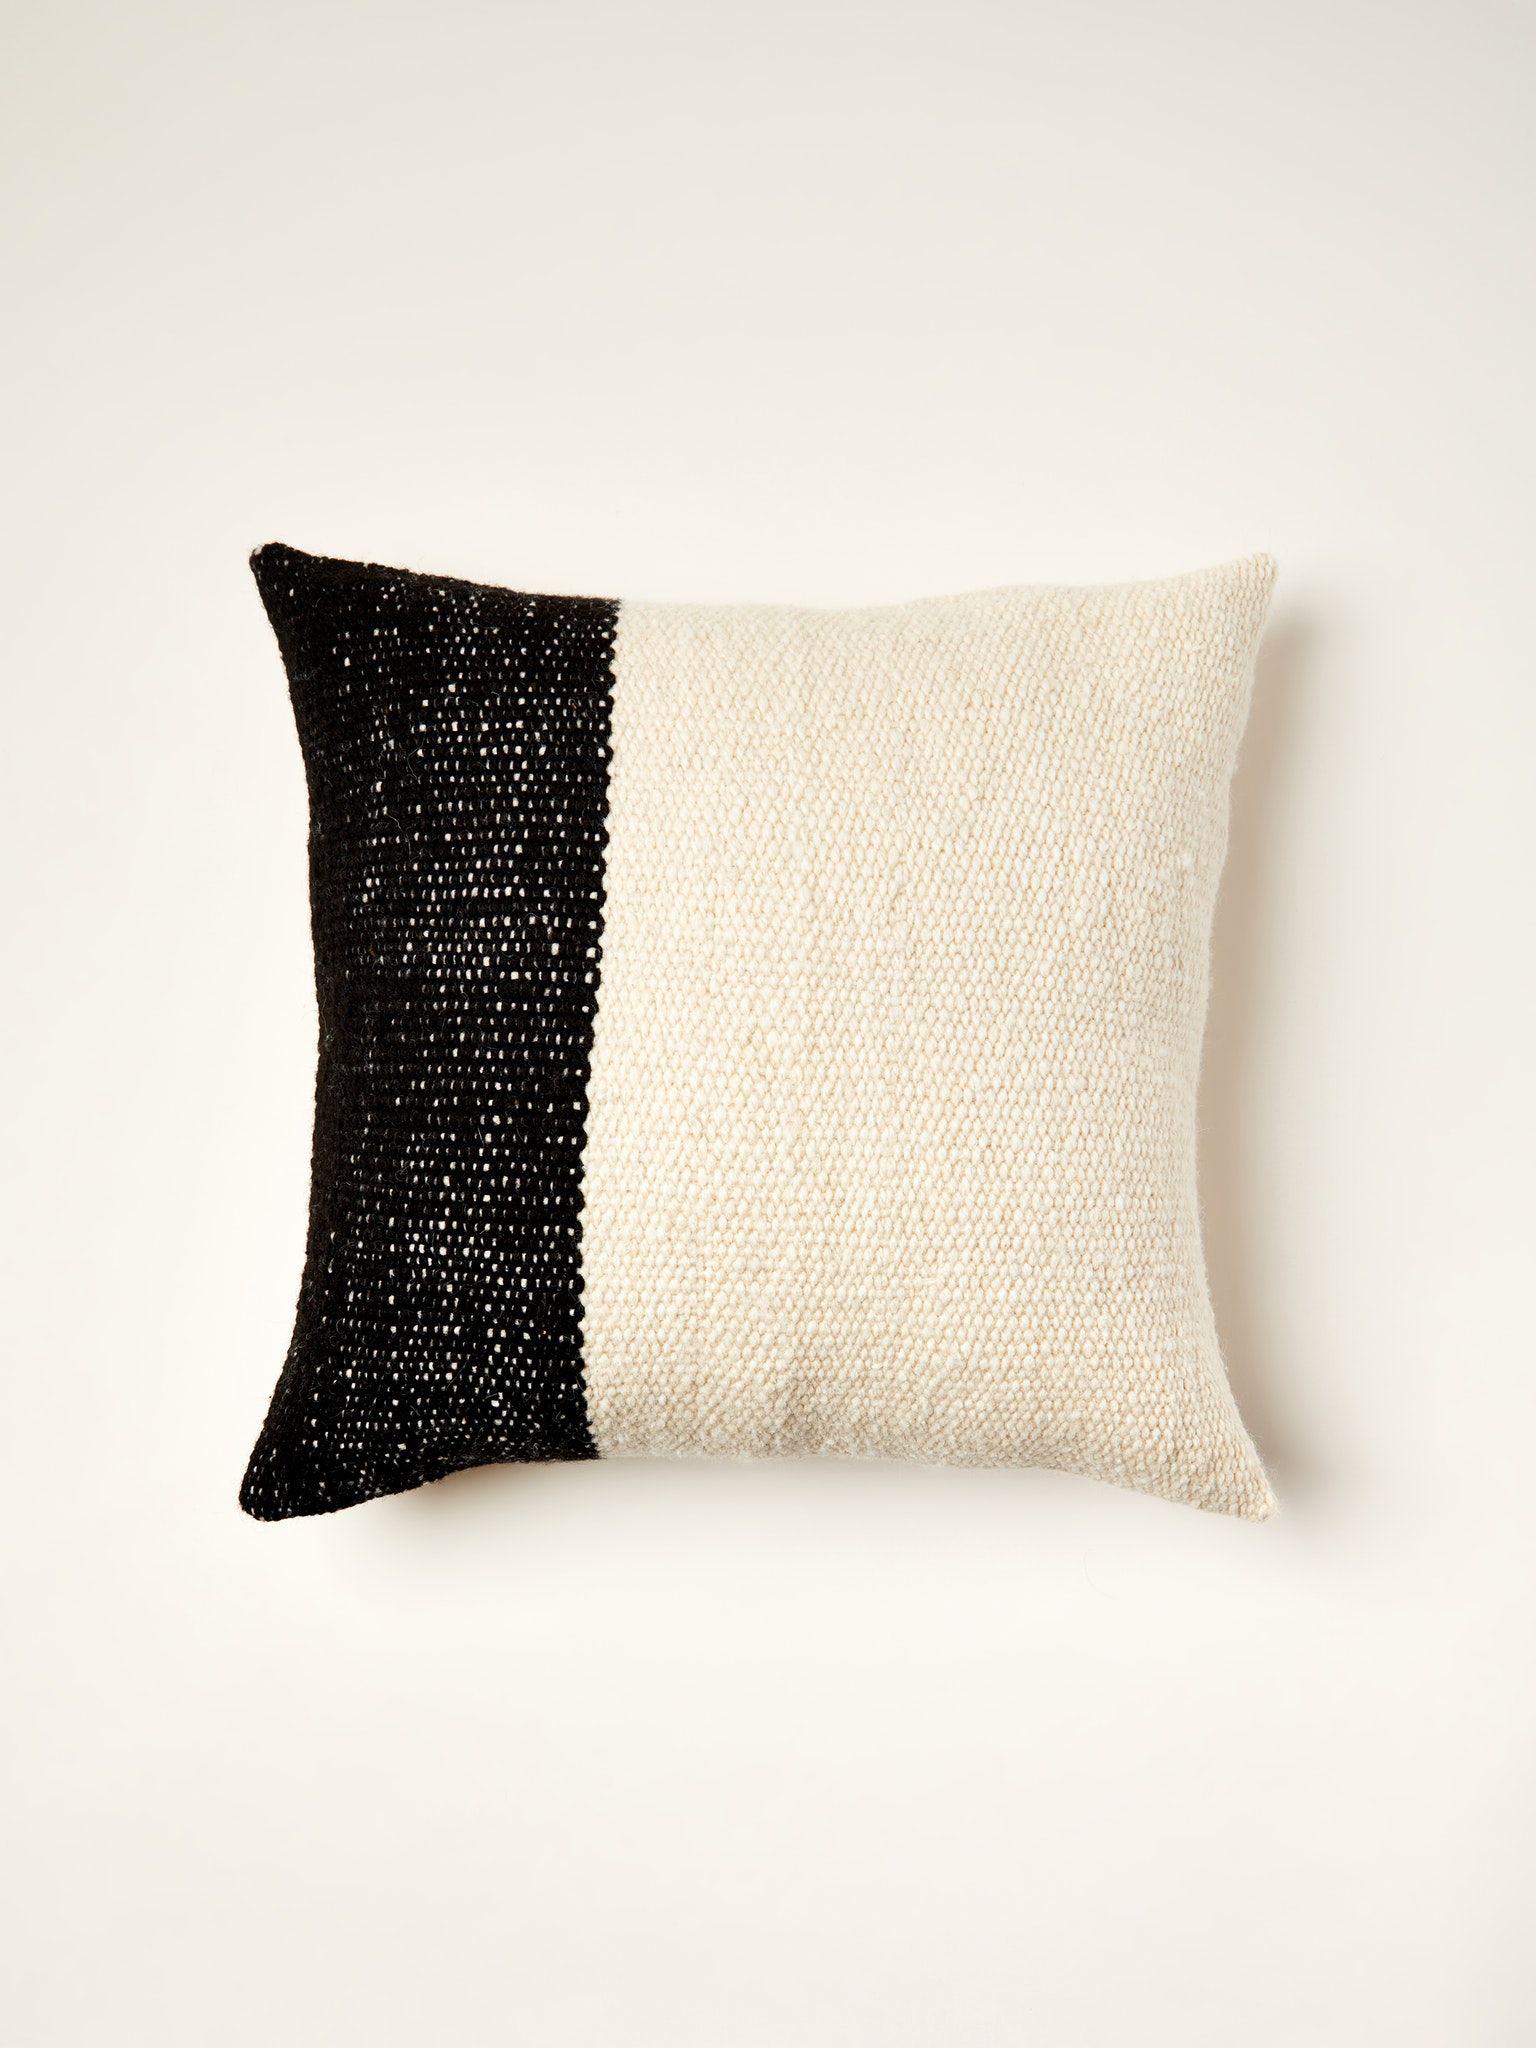 Sien Co Pila Handwoven Pillow Cover Hand Woven Pillows Hand Weaving Throw Pillows